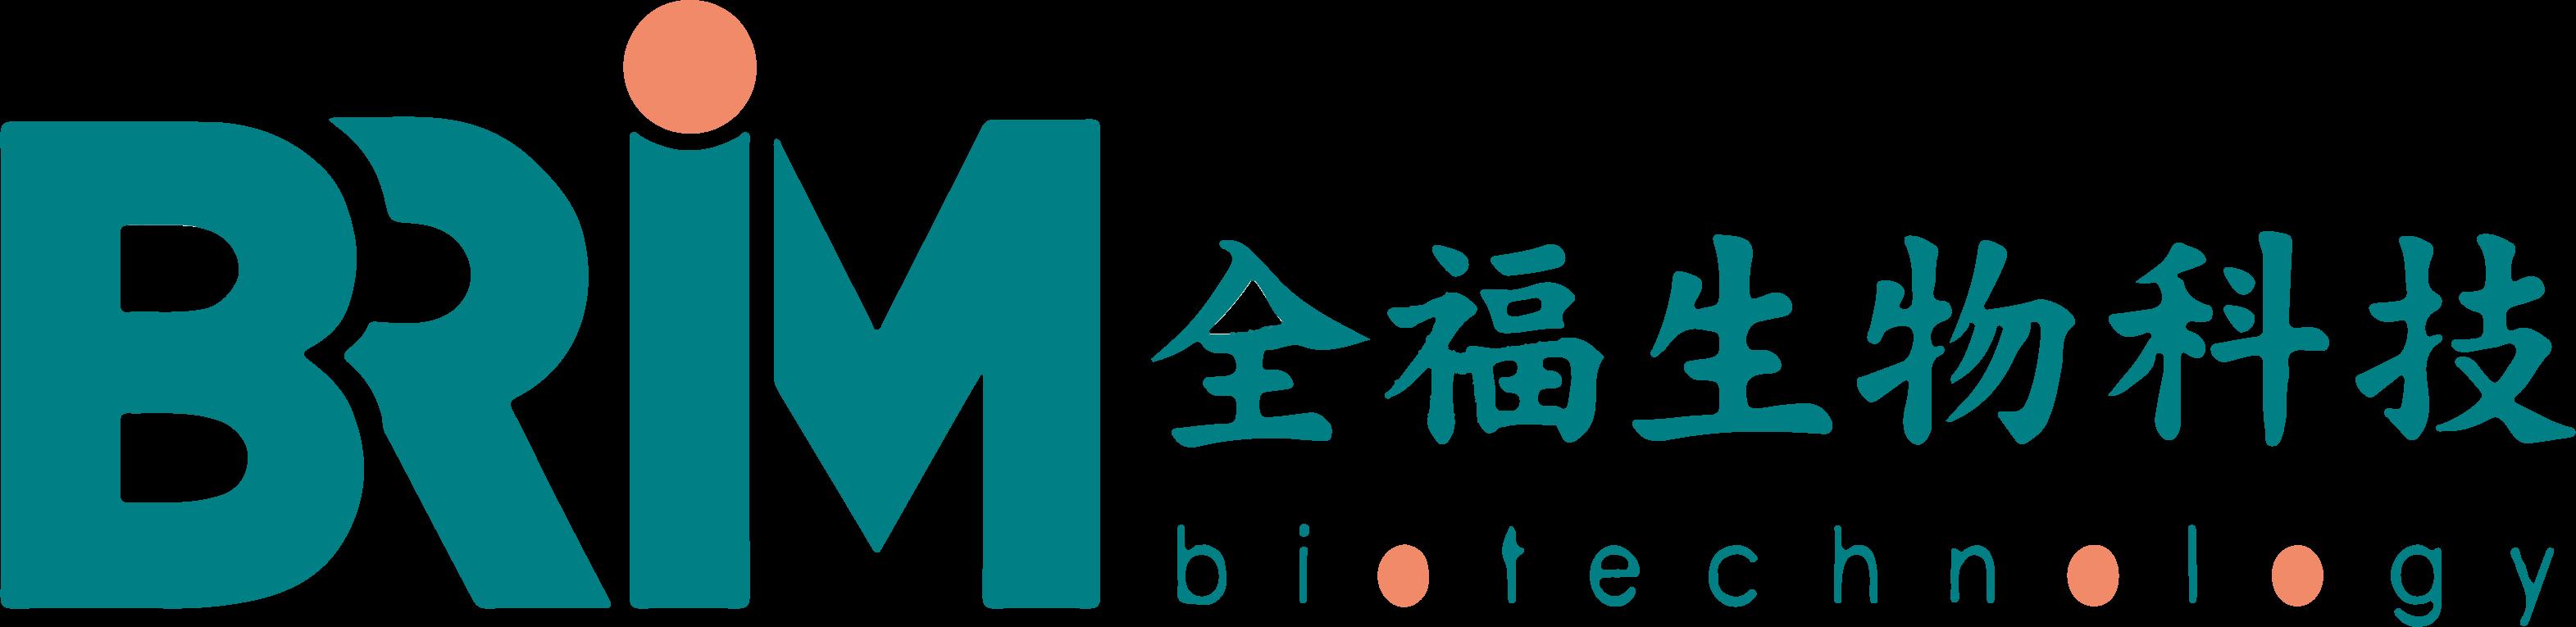 BRIM Biotechnology, Inc.